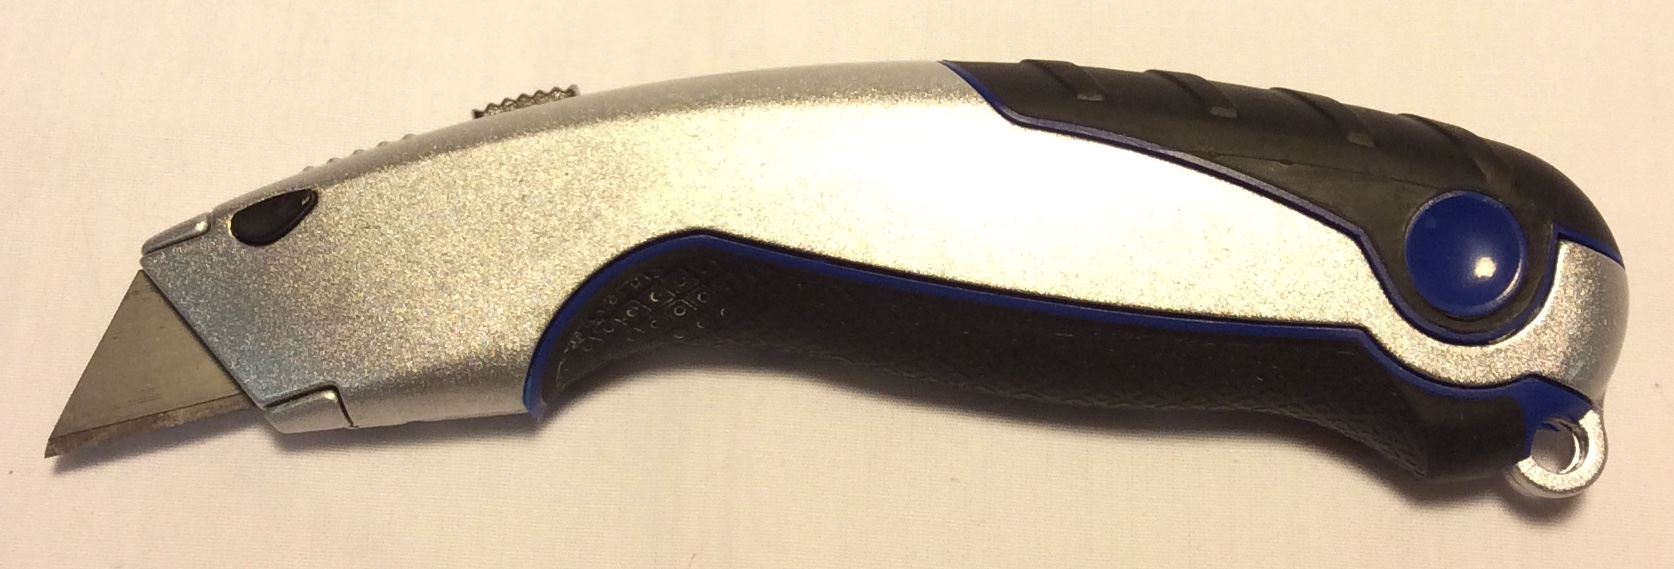 Silver metal box cutter